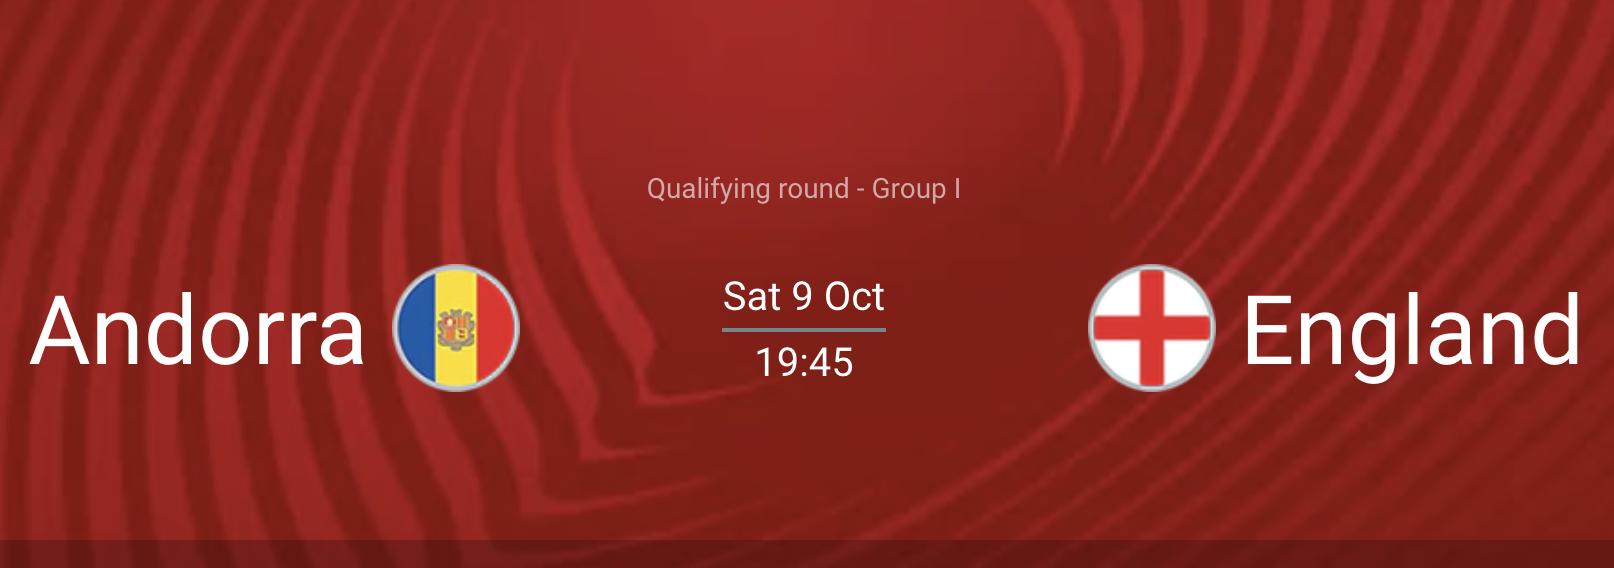 Andorra vs England 9 Oct 2021